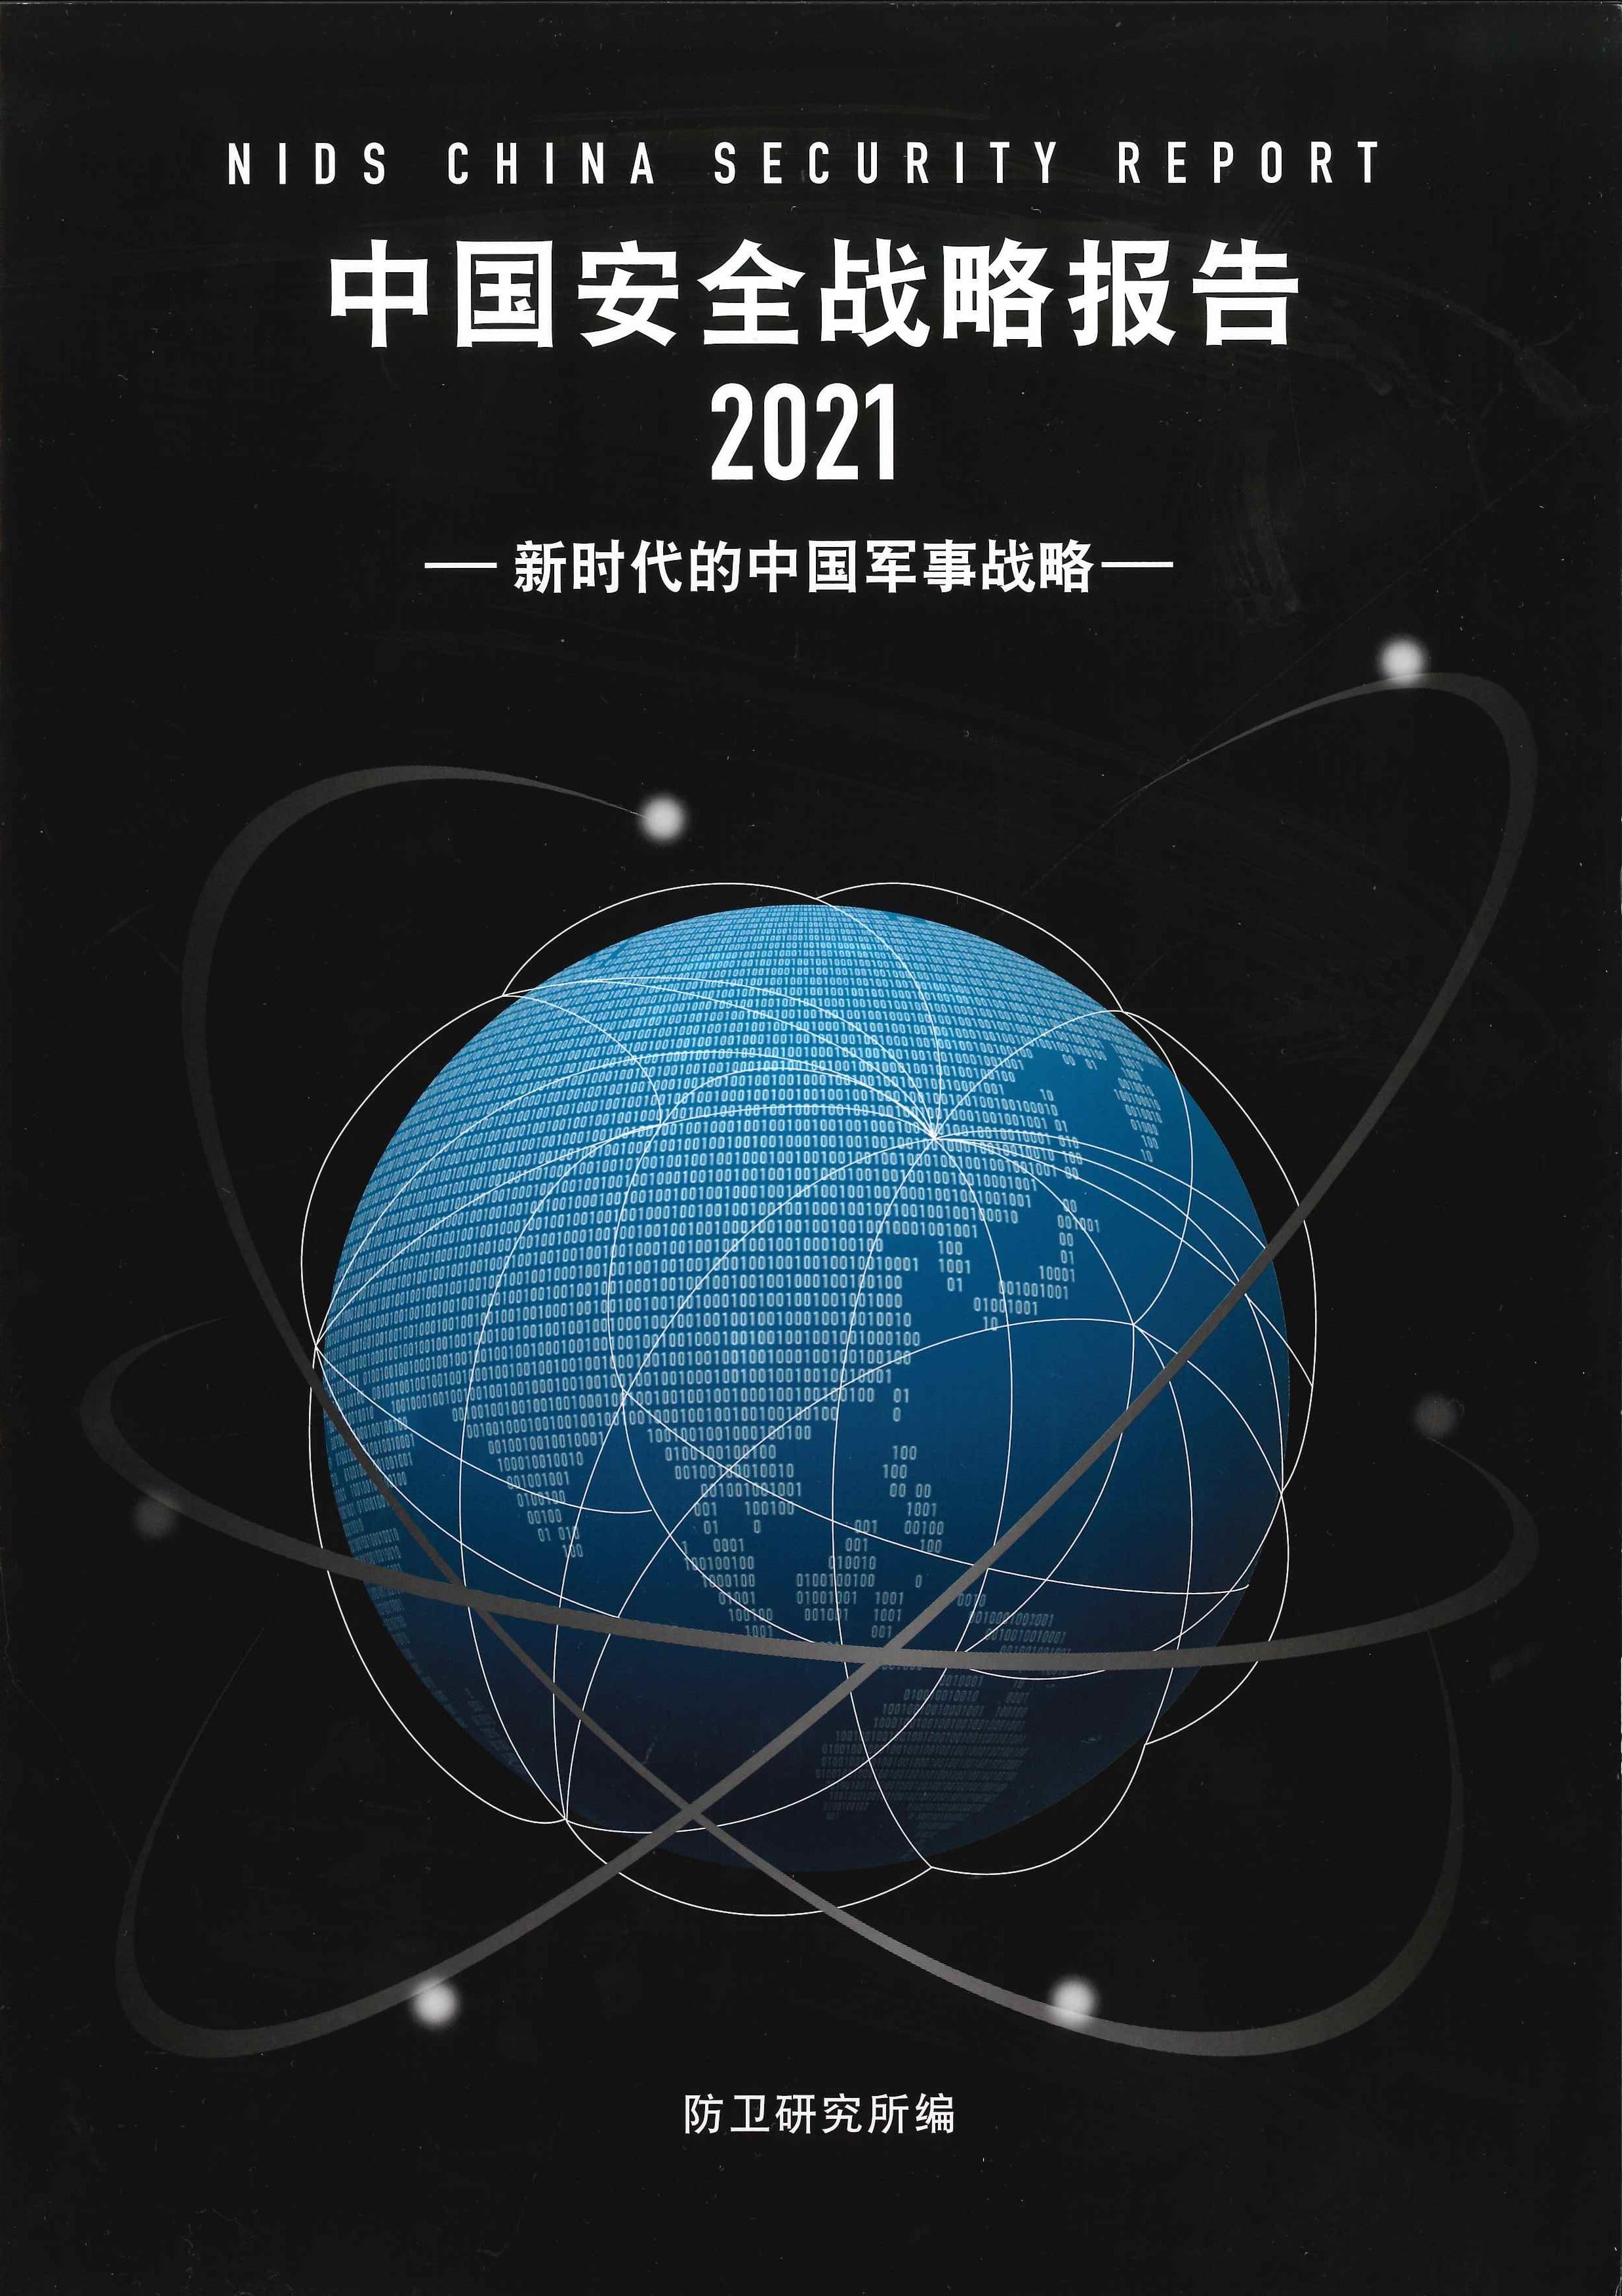 中国安全战略报告=NIDS China security report